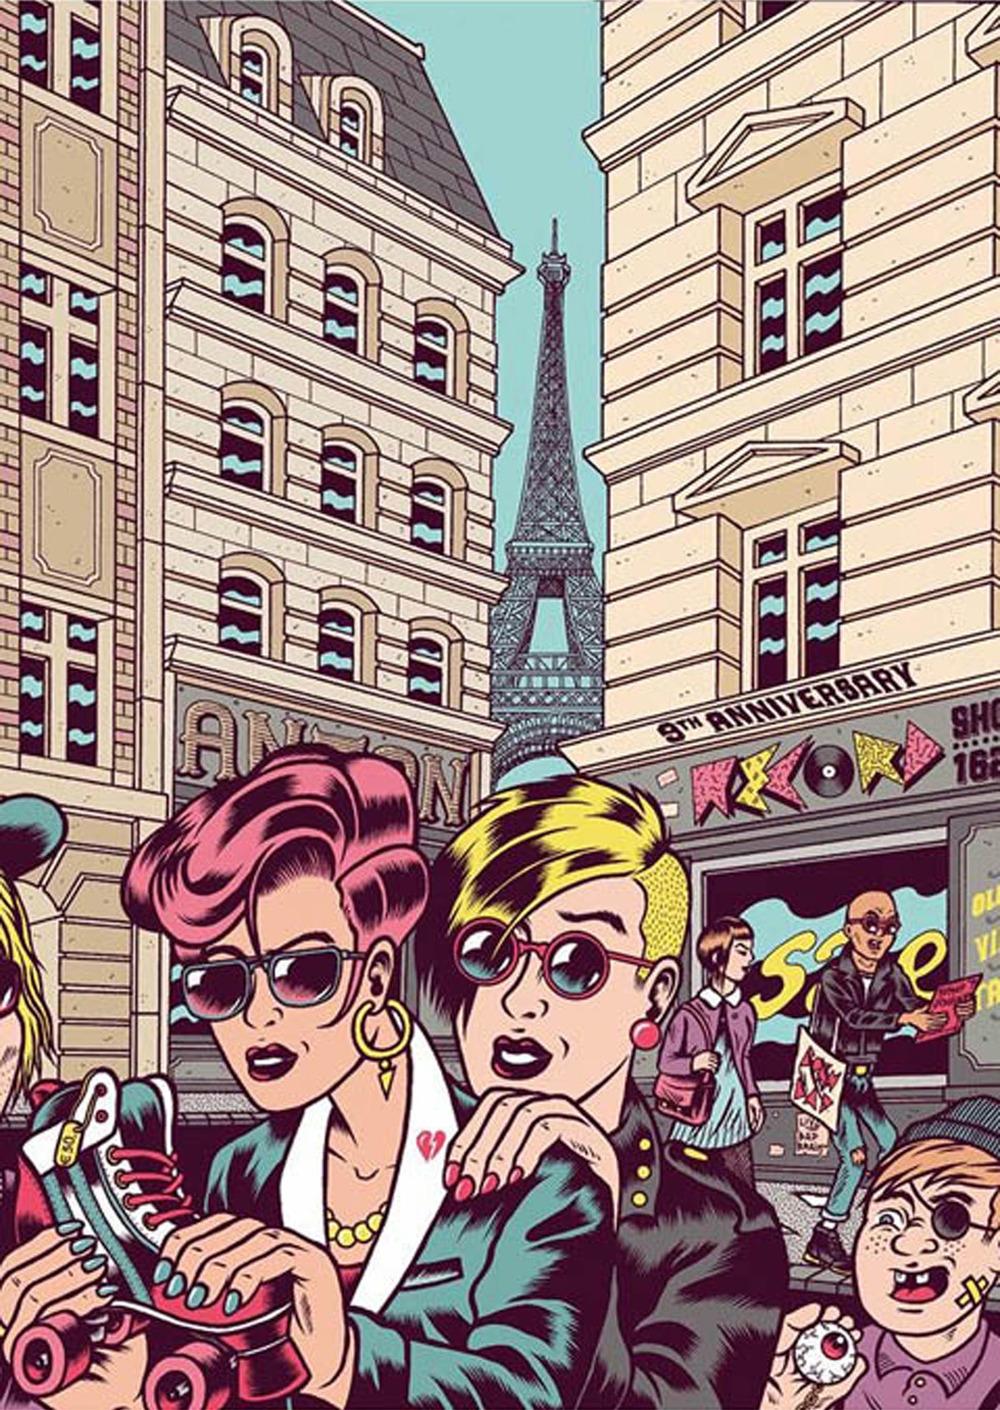 FREAK CITY CLIGNANCOURT, 2013